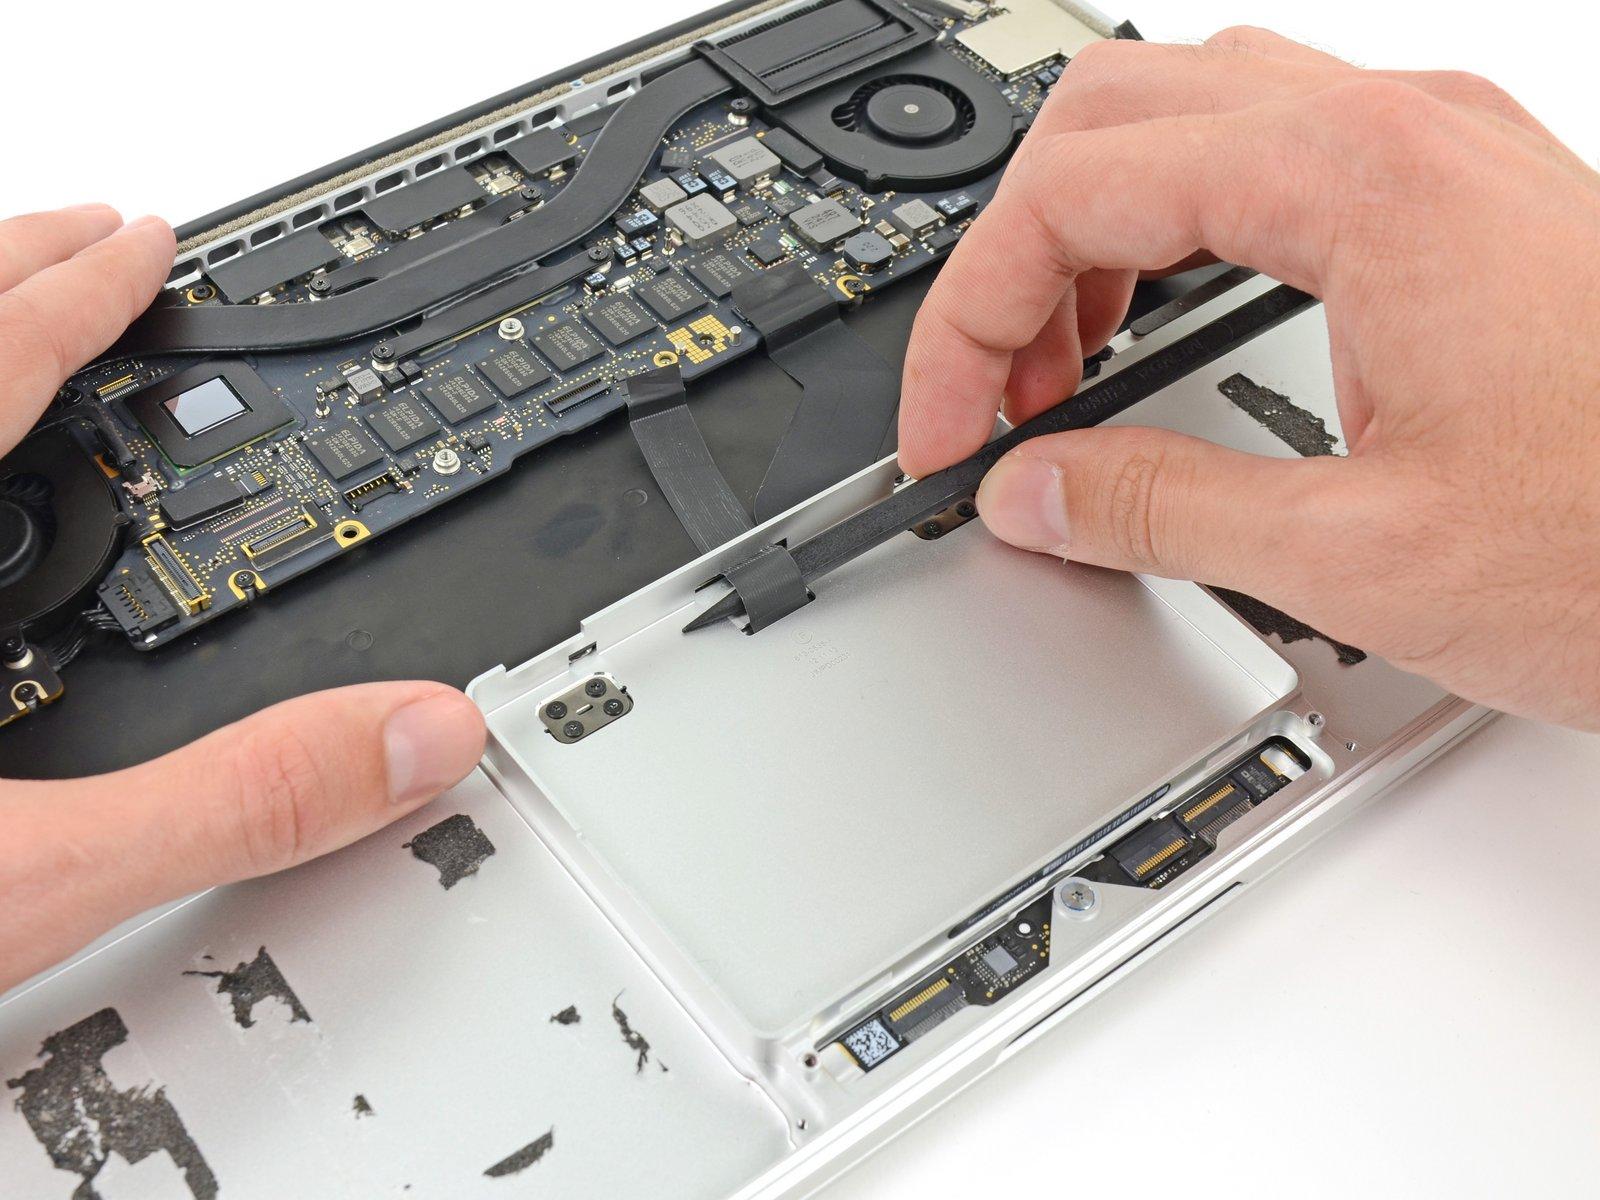 Ремонт тачпада на ноутбуке своими руками